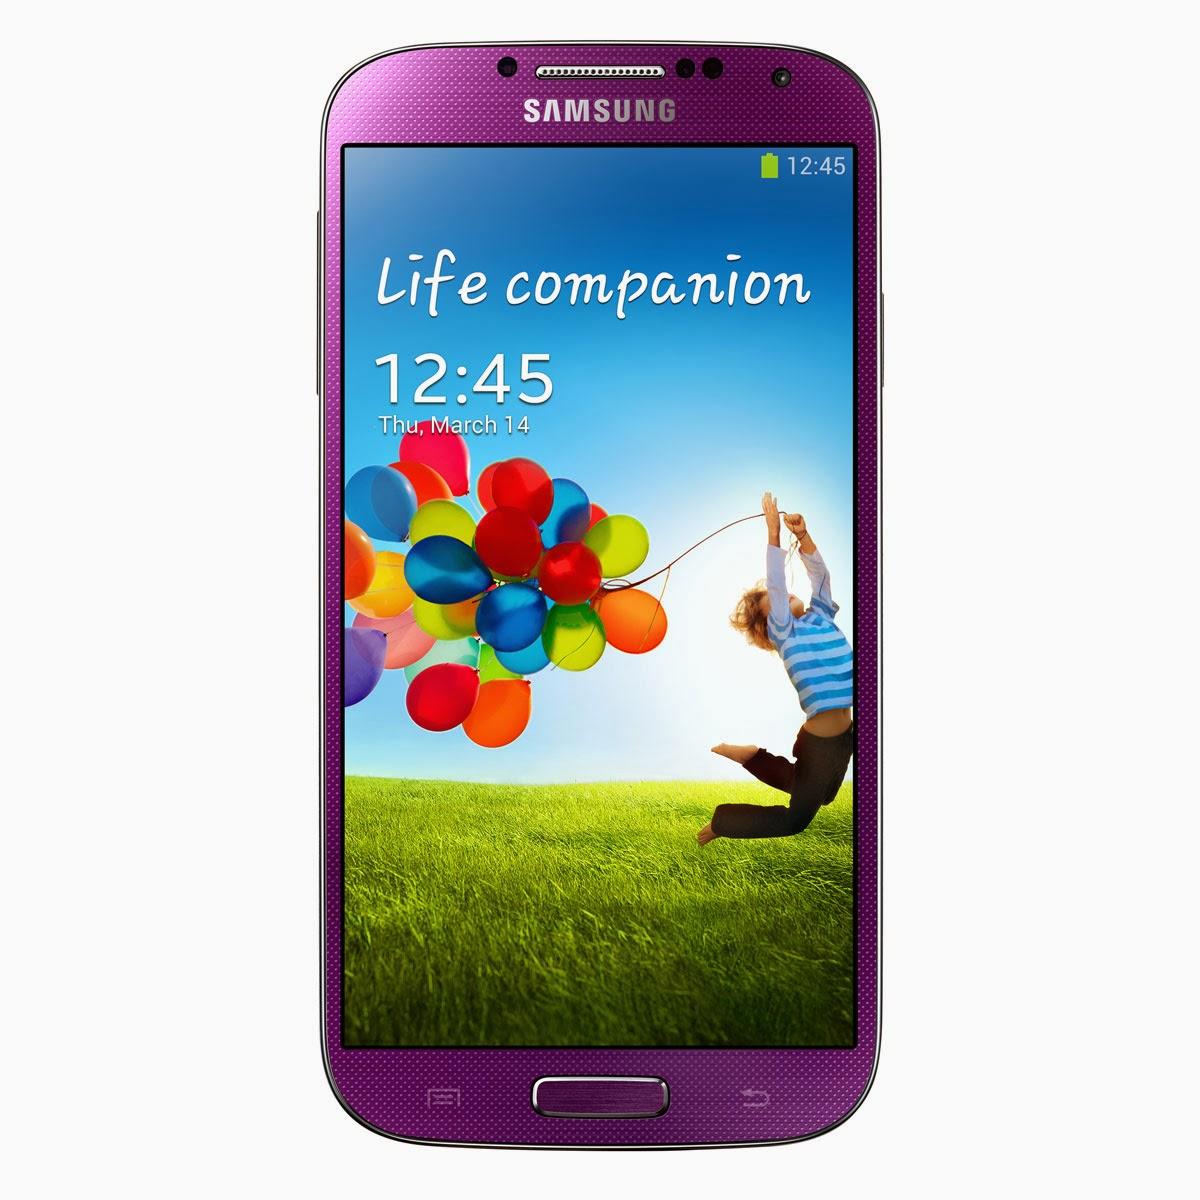 samsung galaxy s4 violet 4g 16go comparaison smartphone comparatif smartphones. Black Bedroom Furniture Sets. Home Design Ideas